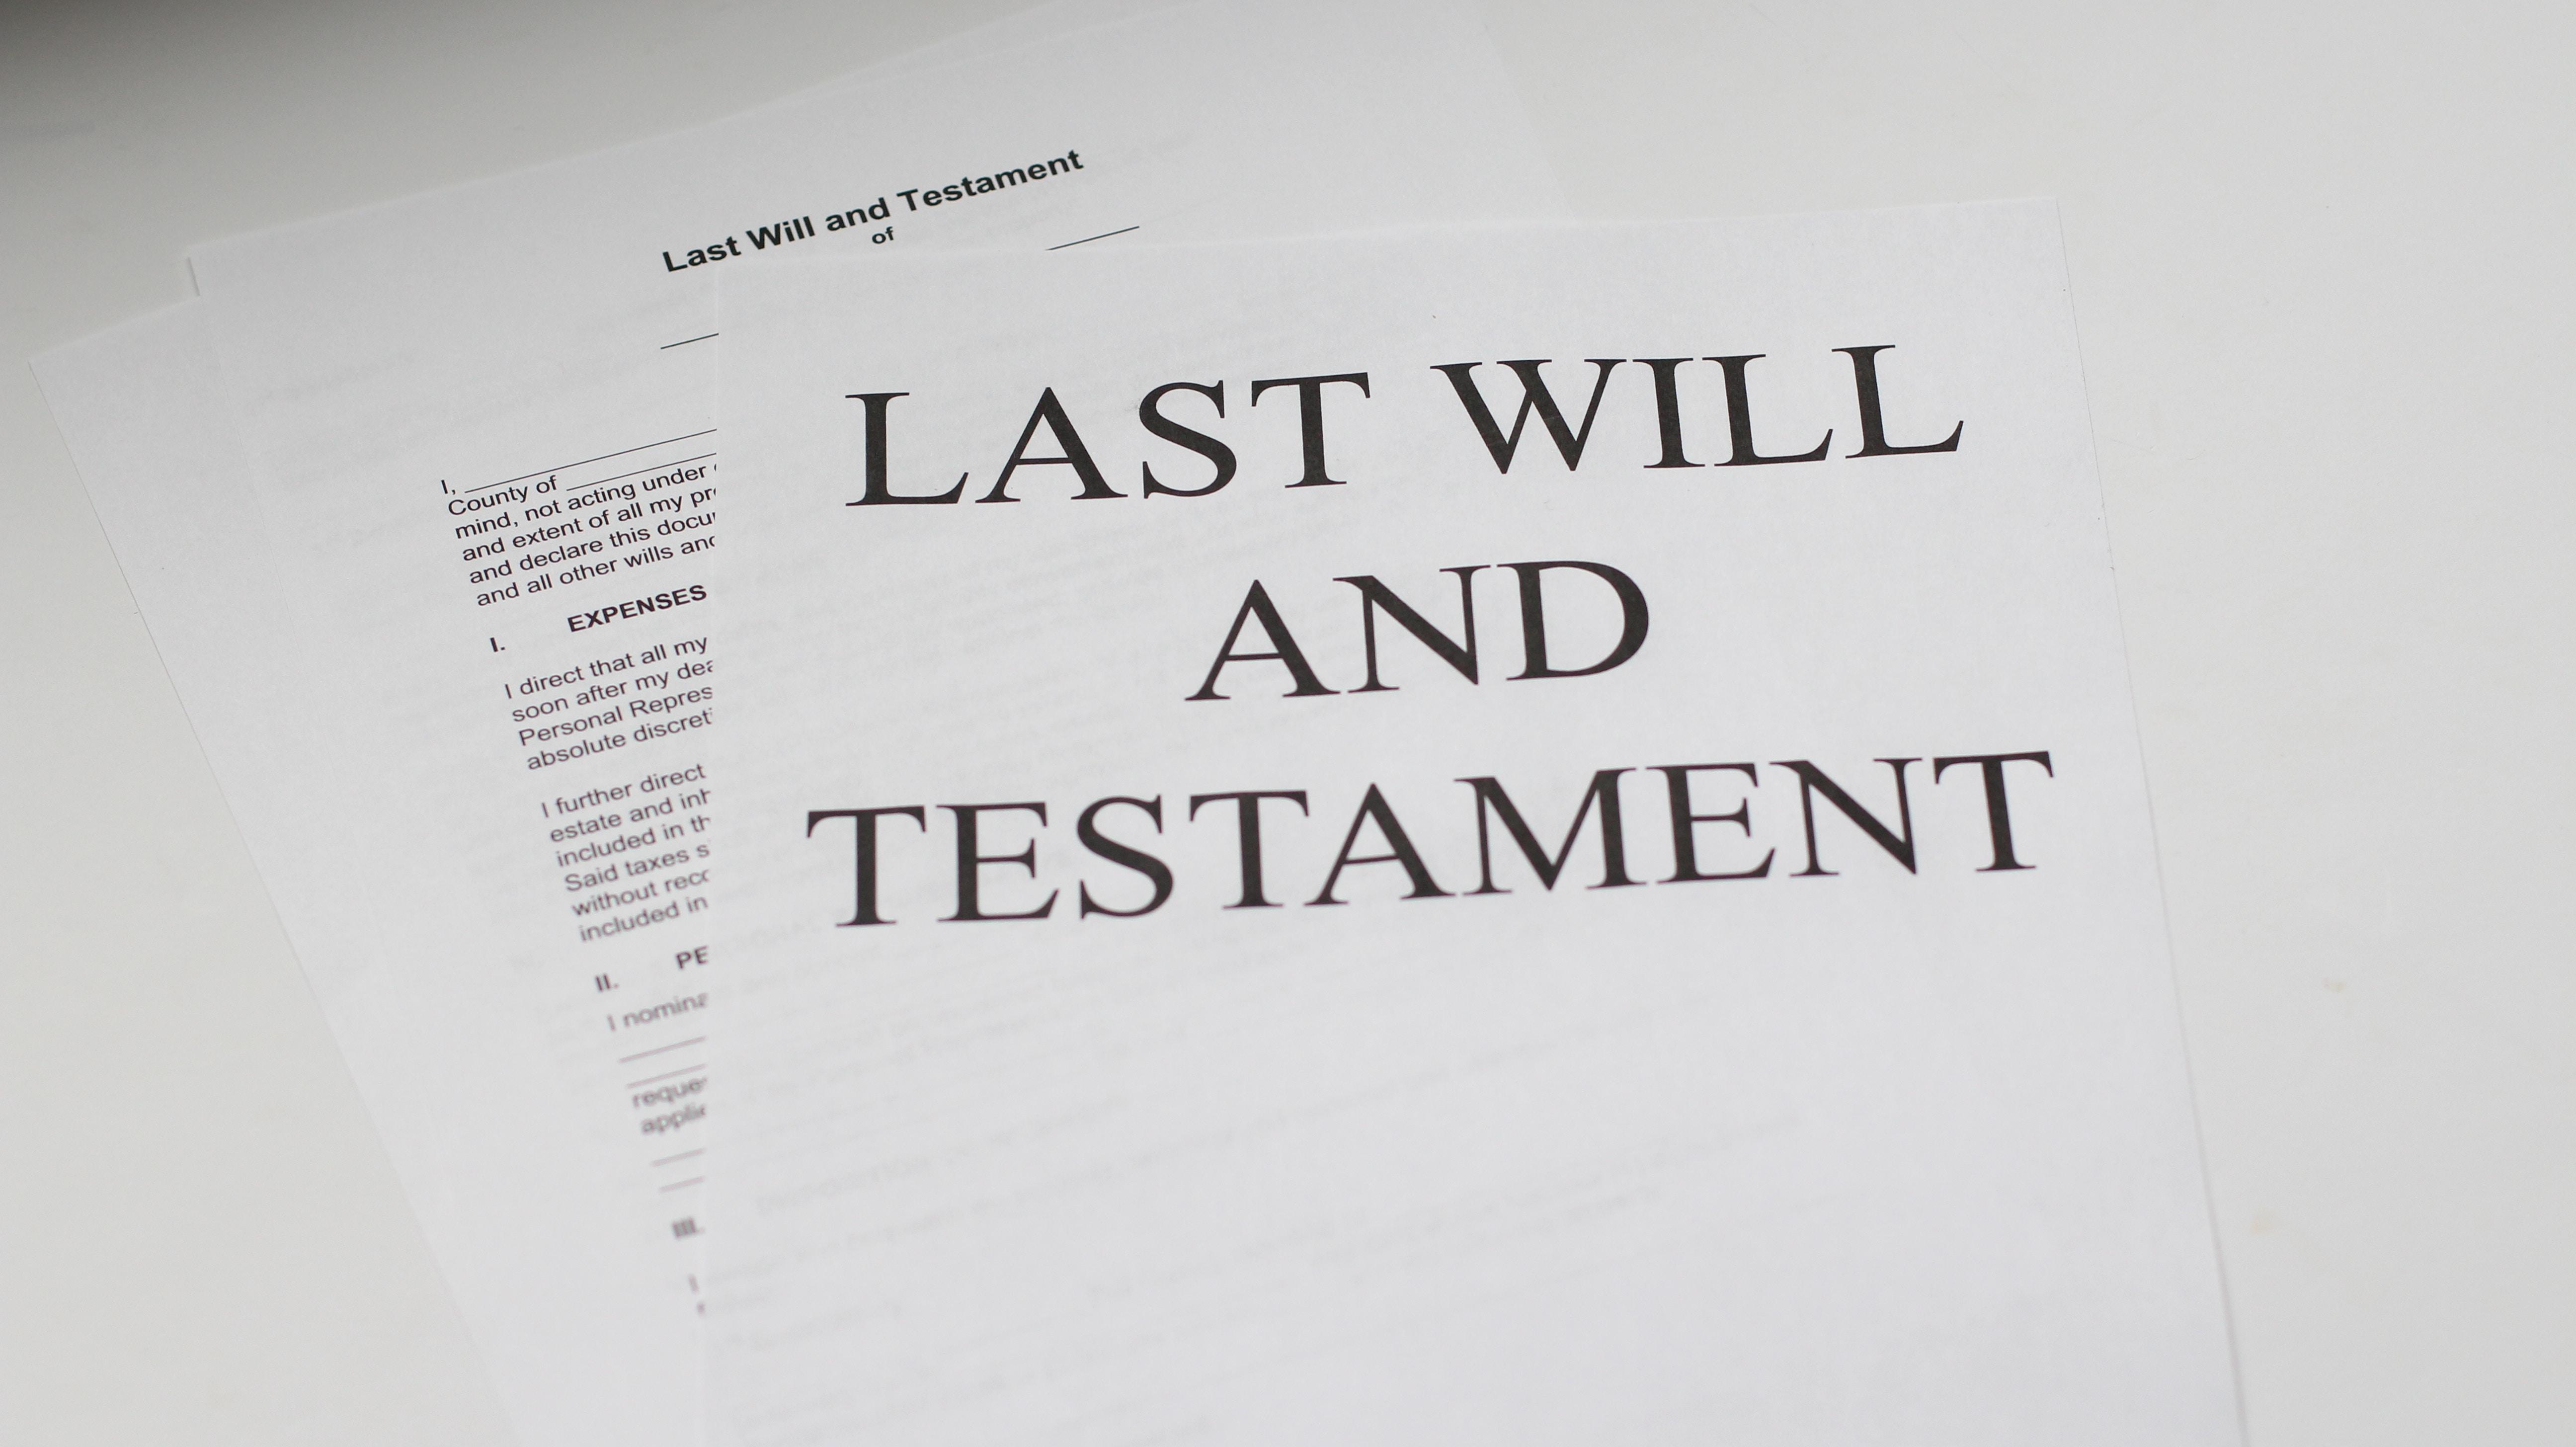 Inheritance Tax at record high